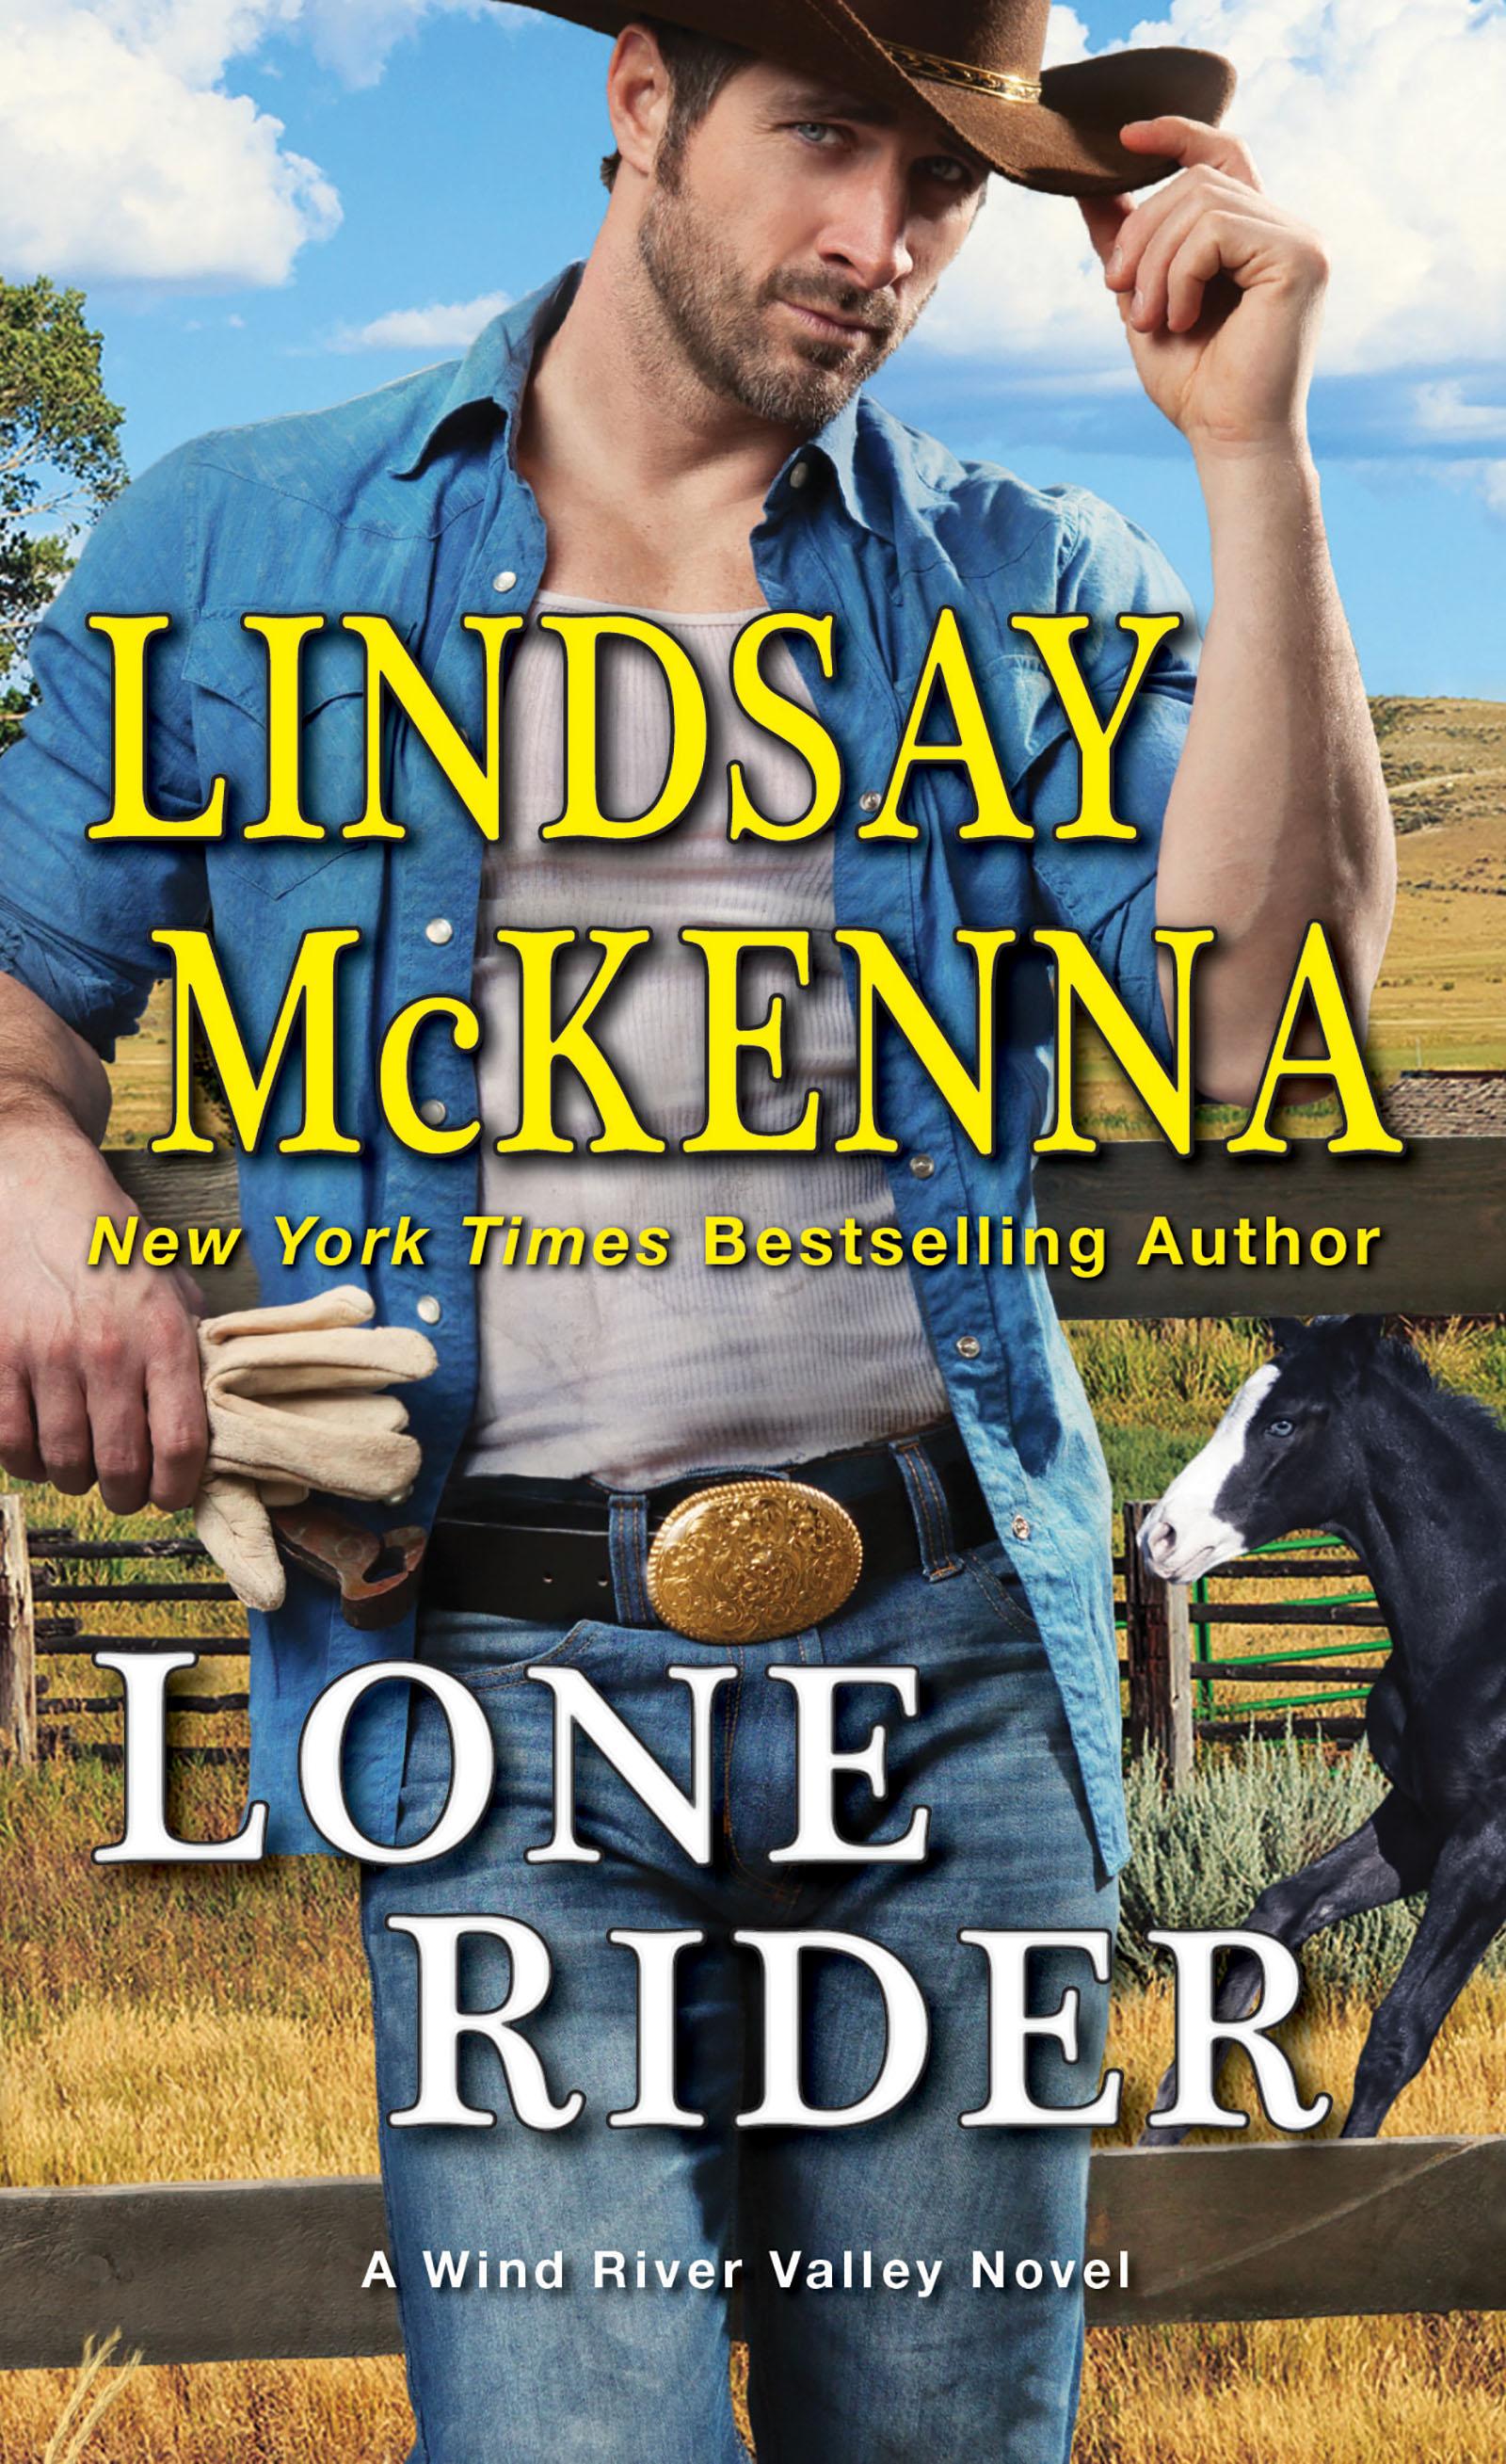 Lone rider cover image